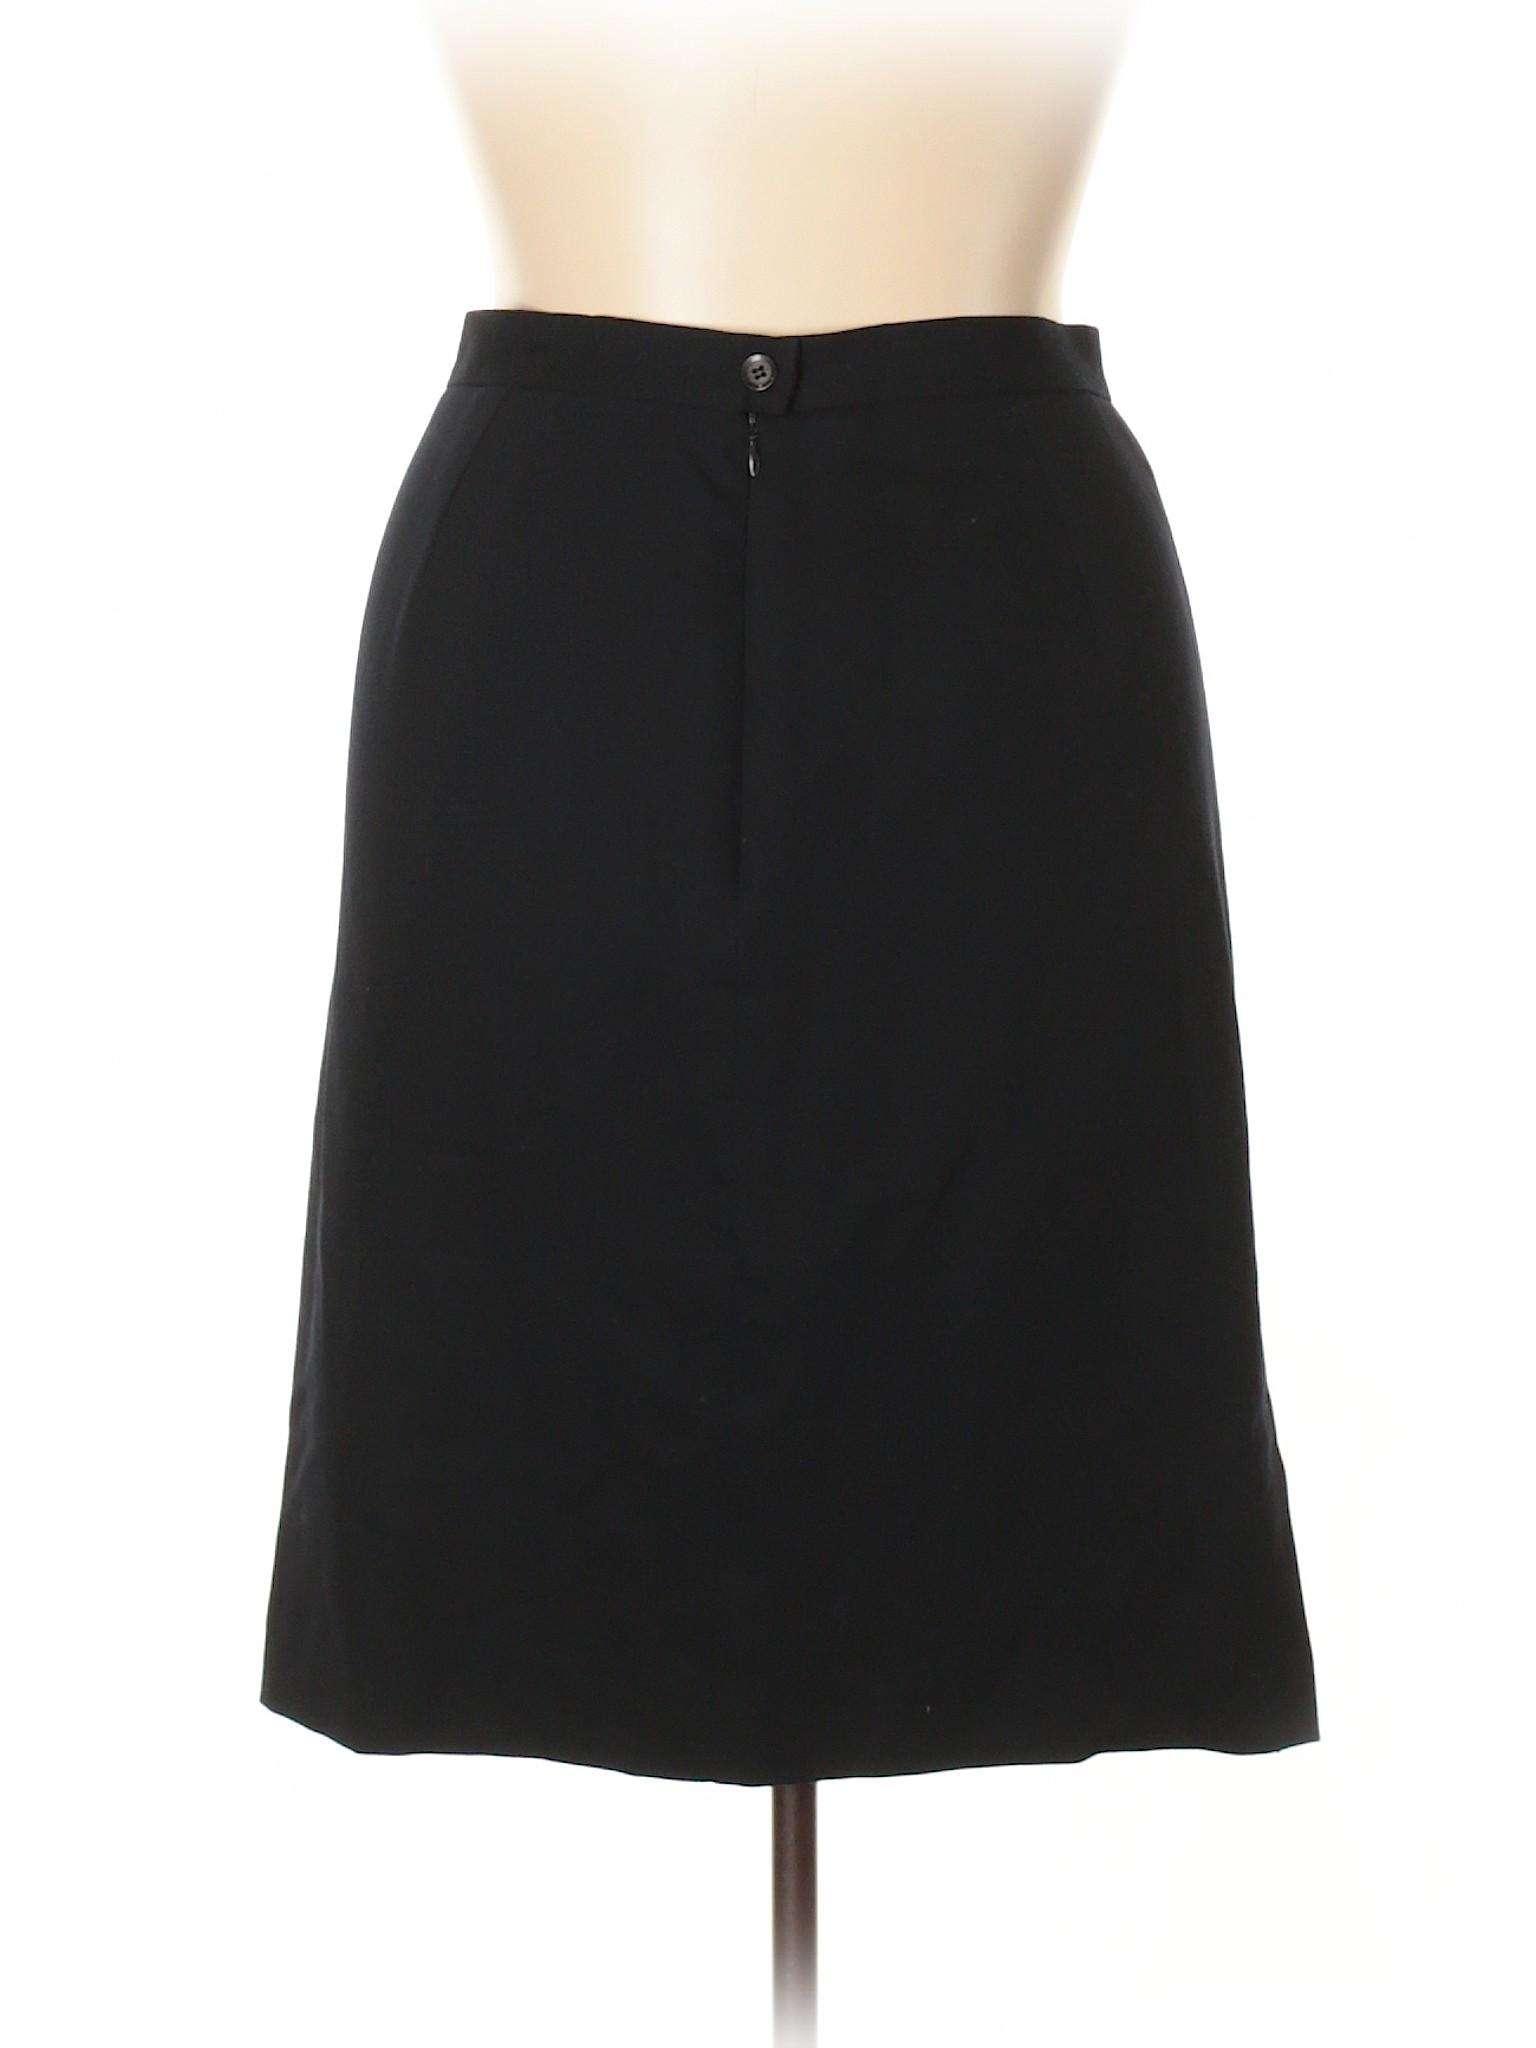 Skirt Boutique Boutique Wool Skirt Skirt Boutique Wool Wool RwfT44I